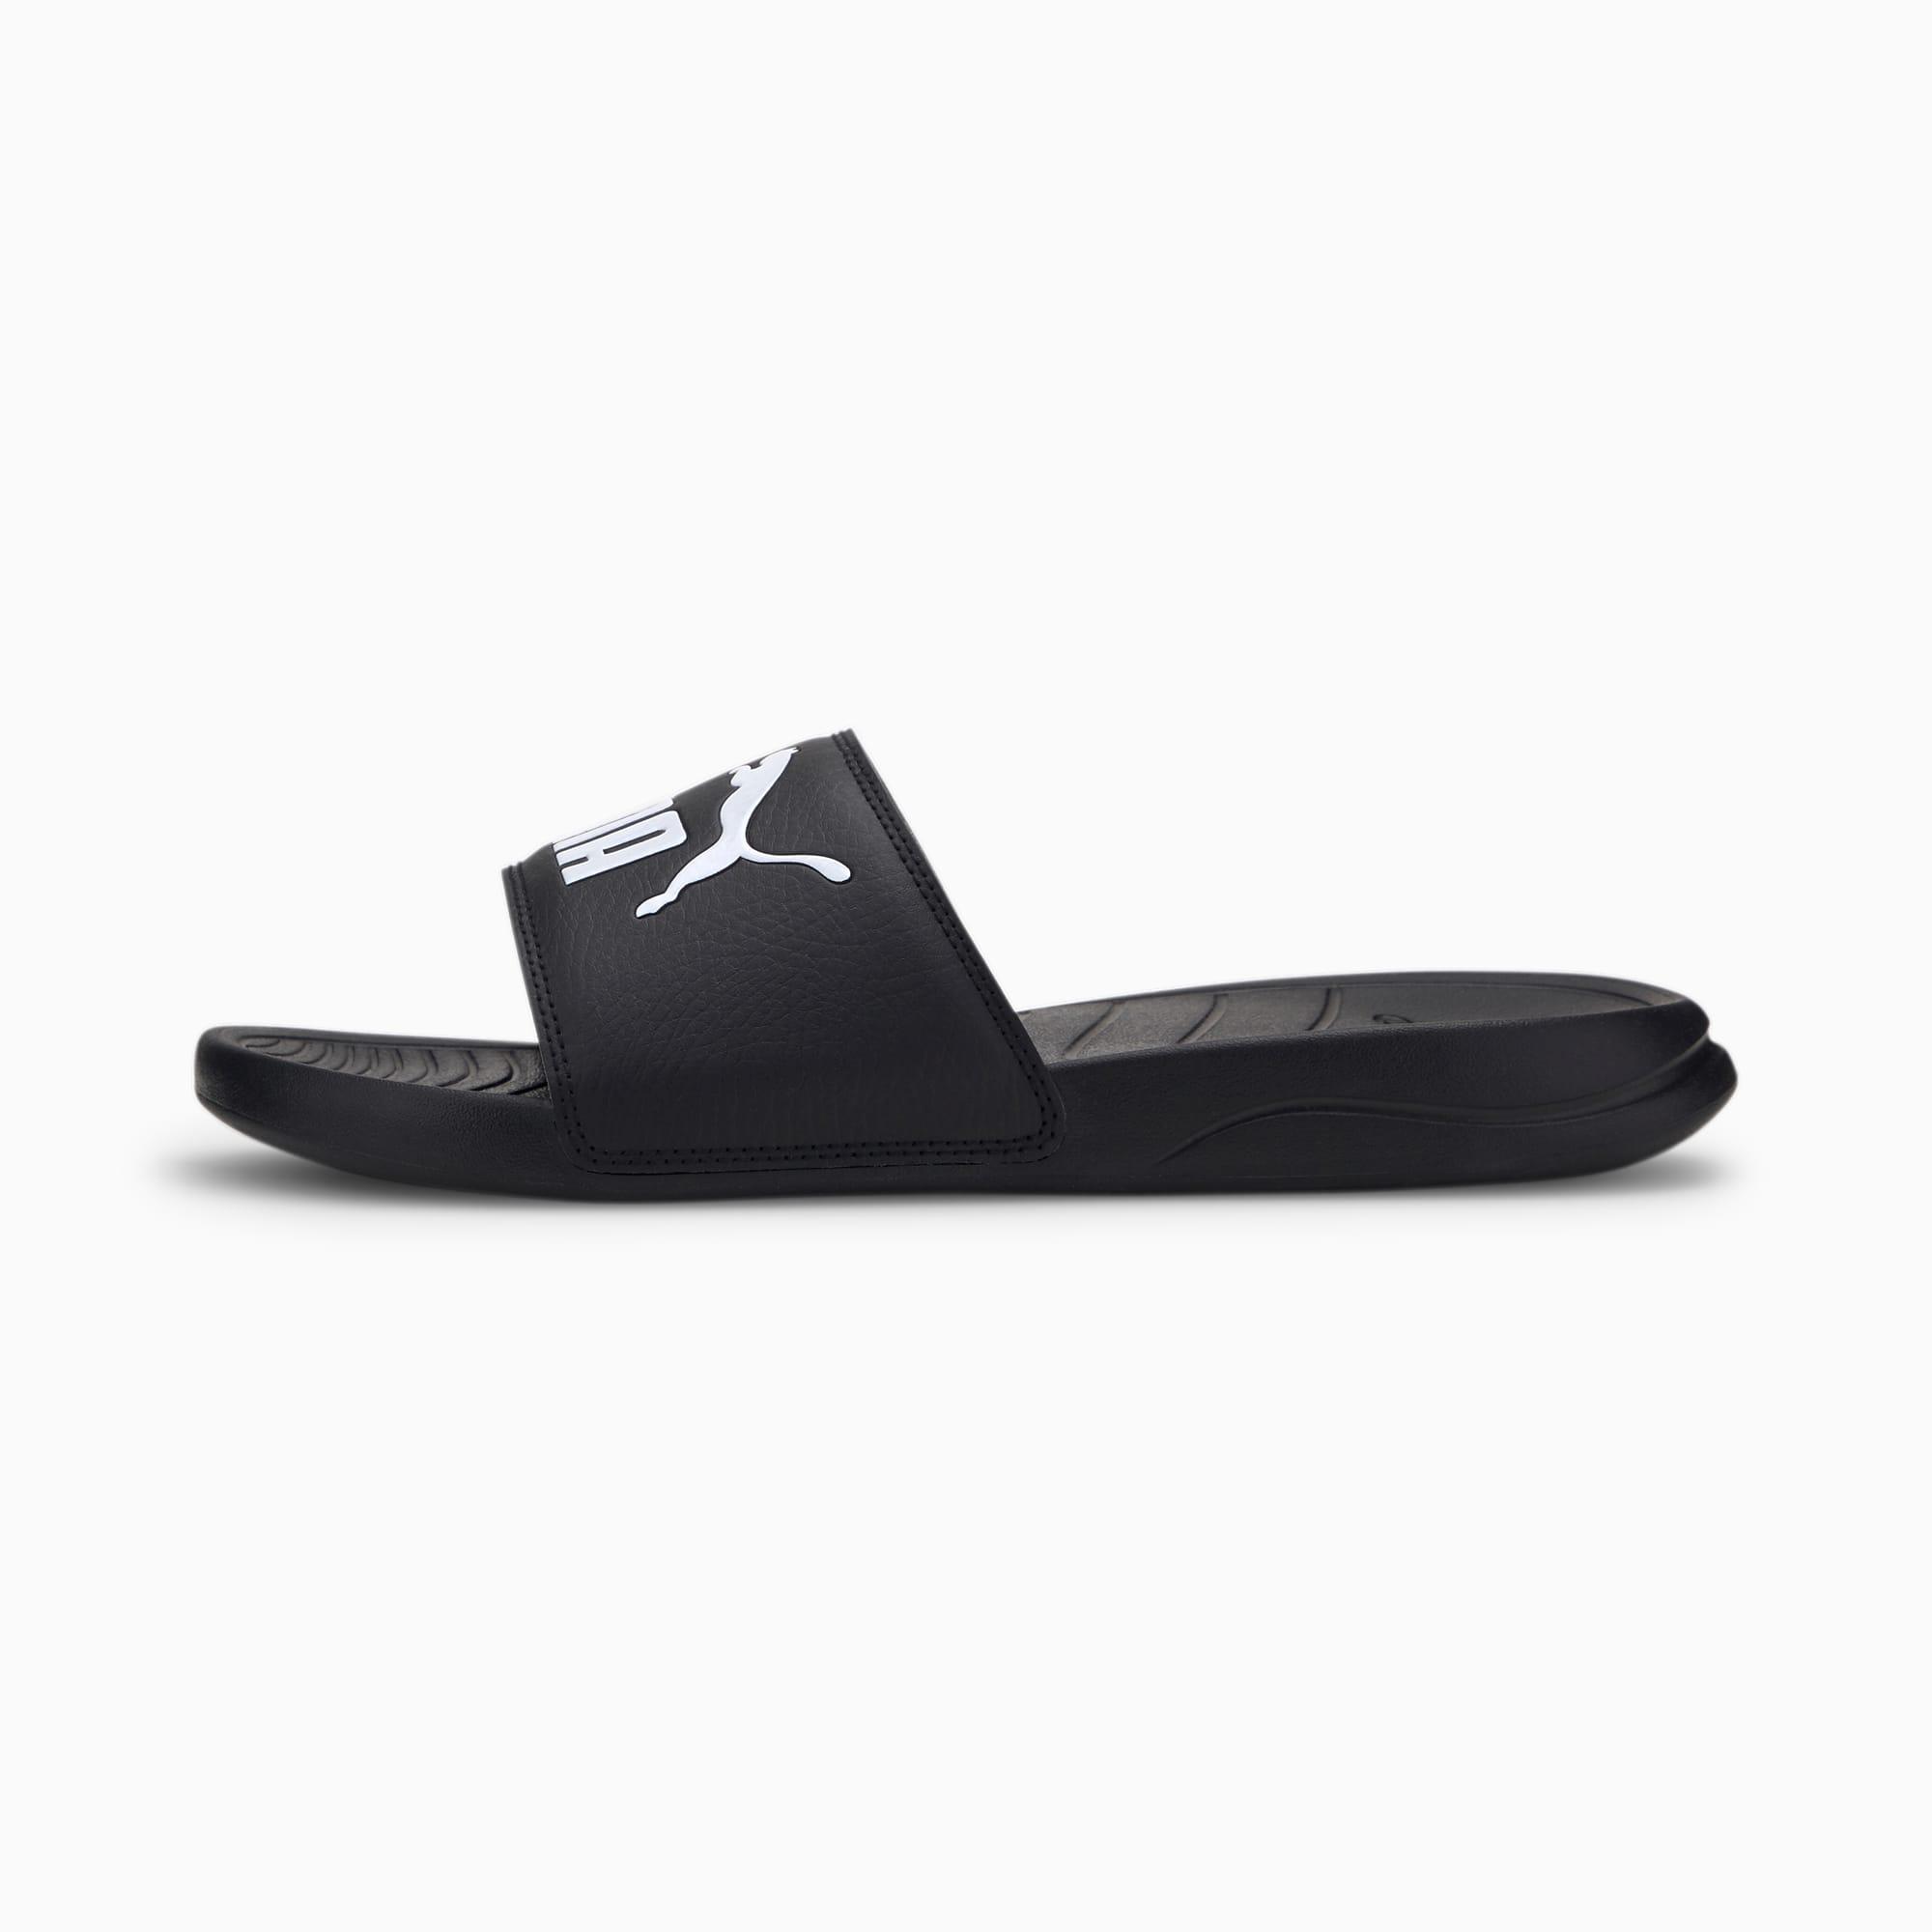 Popcat 20 sandalen, Wit/Zwart, Maat 49,5   PUMA